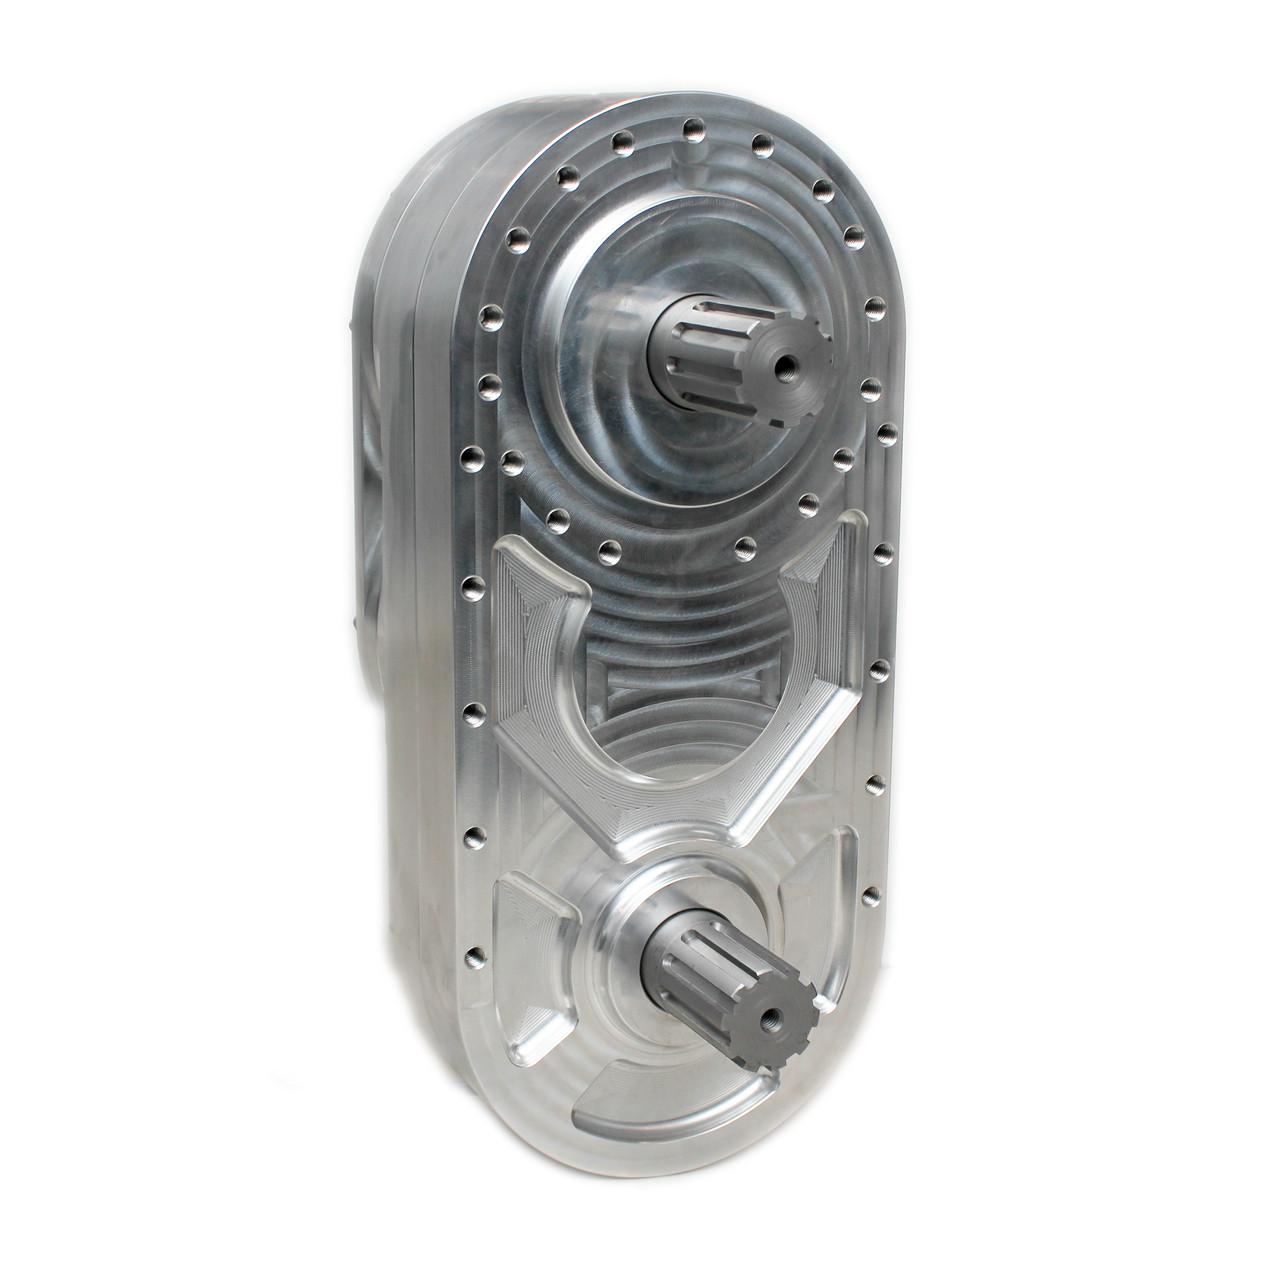 "sniper 10"" billet transfer case gearbox fti performance"